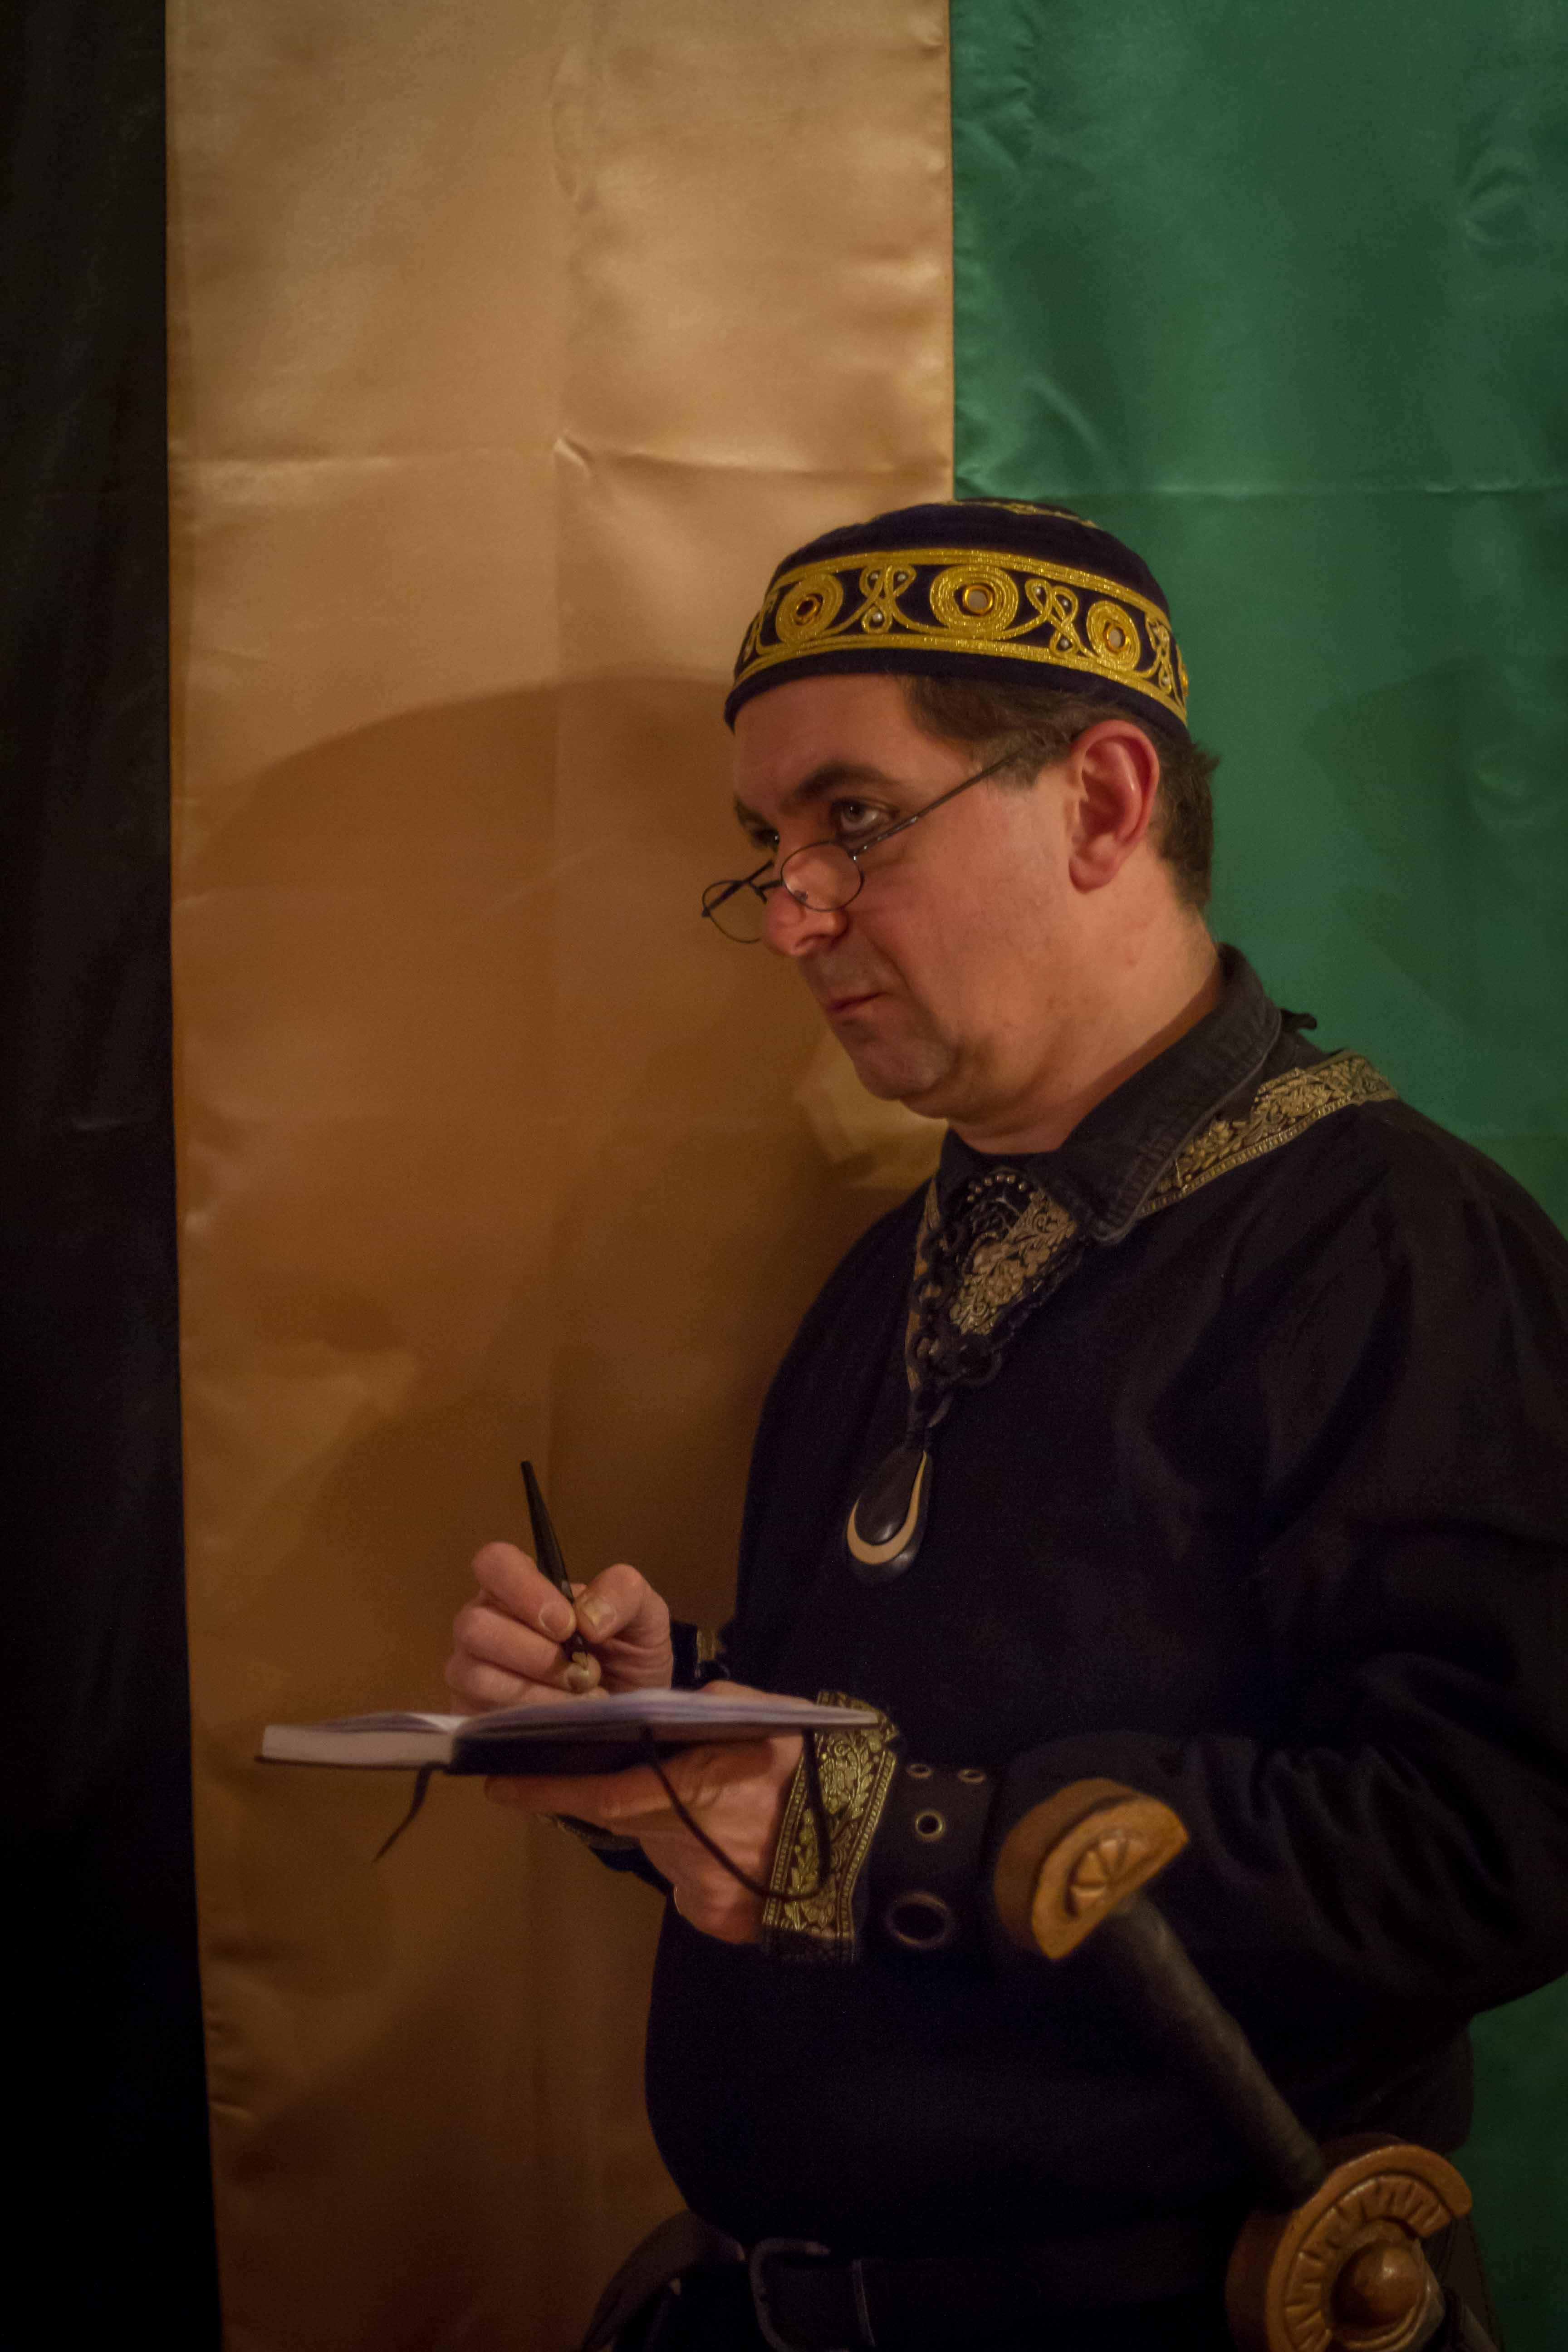 Ras Skarayus Rashidaridjan, der Stratege